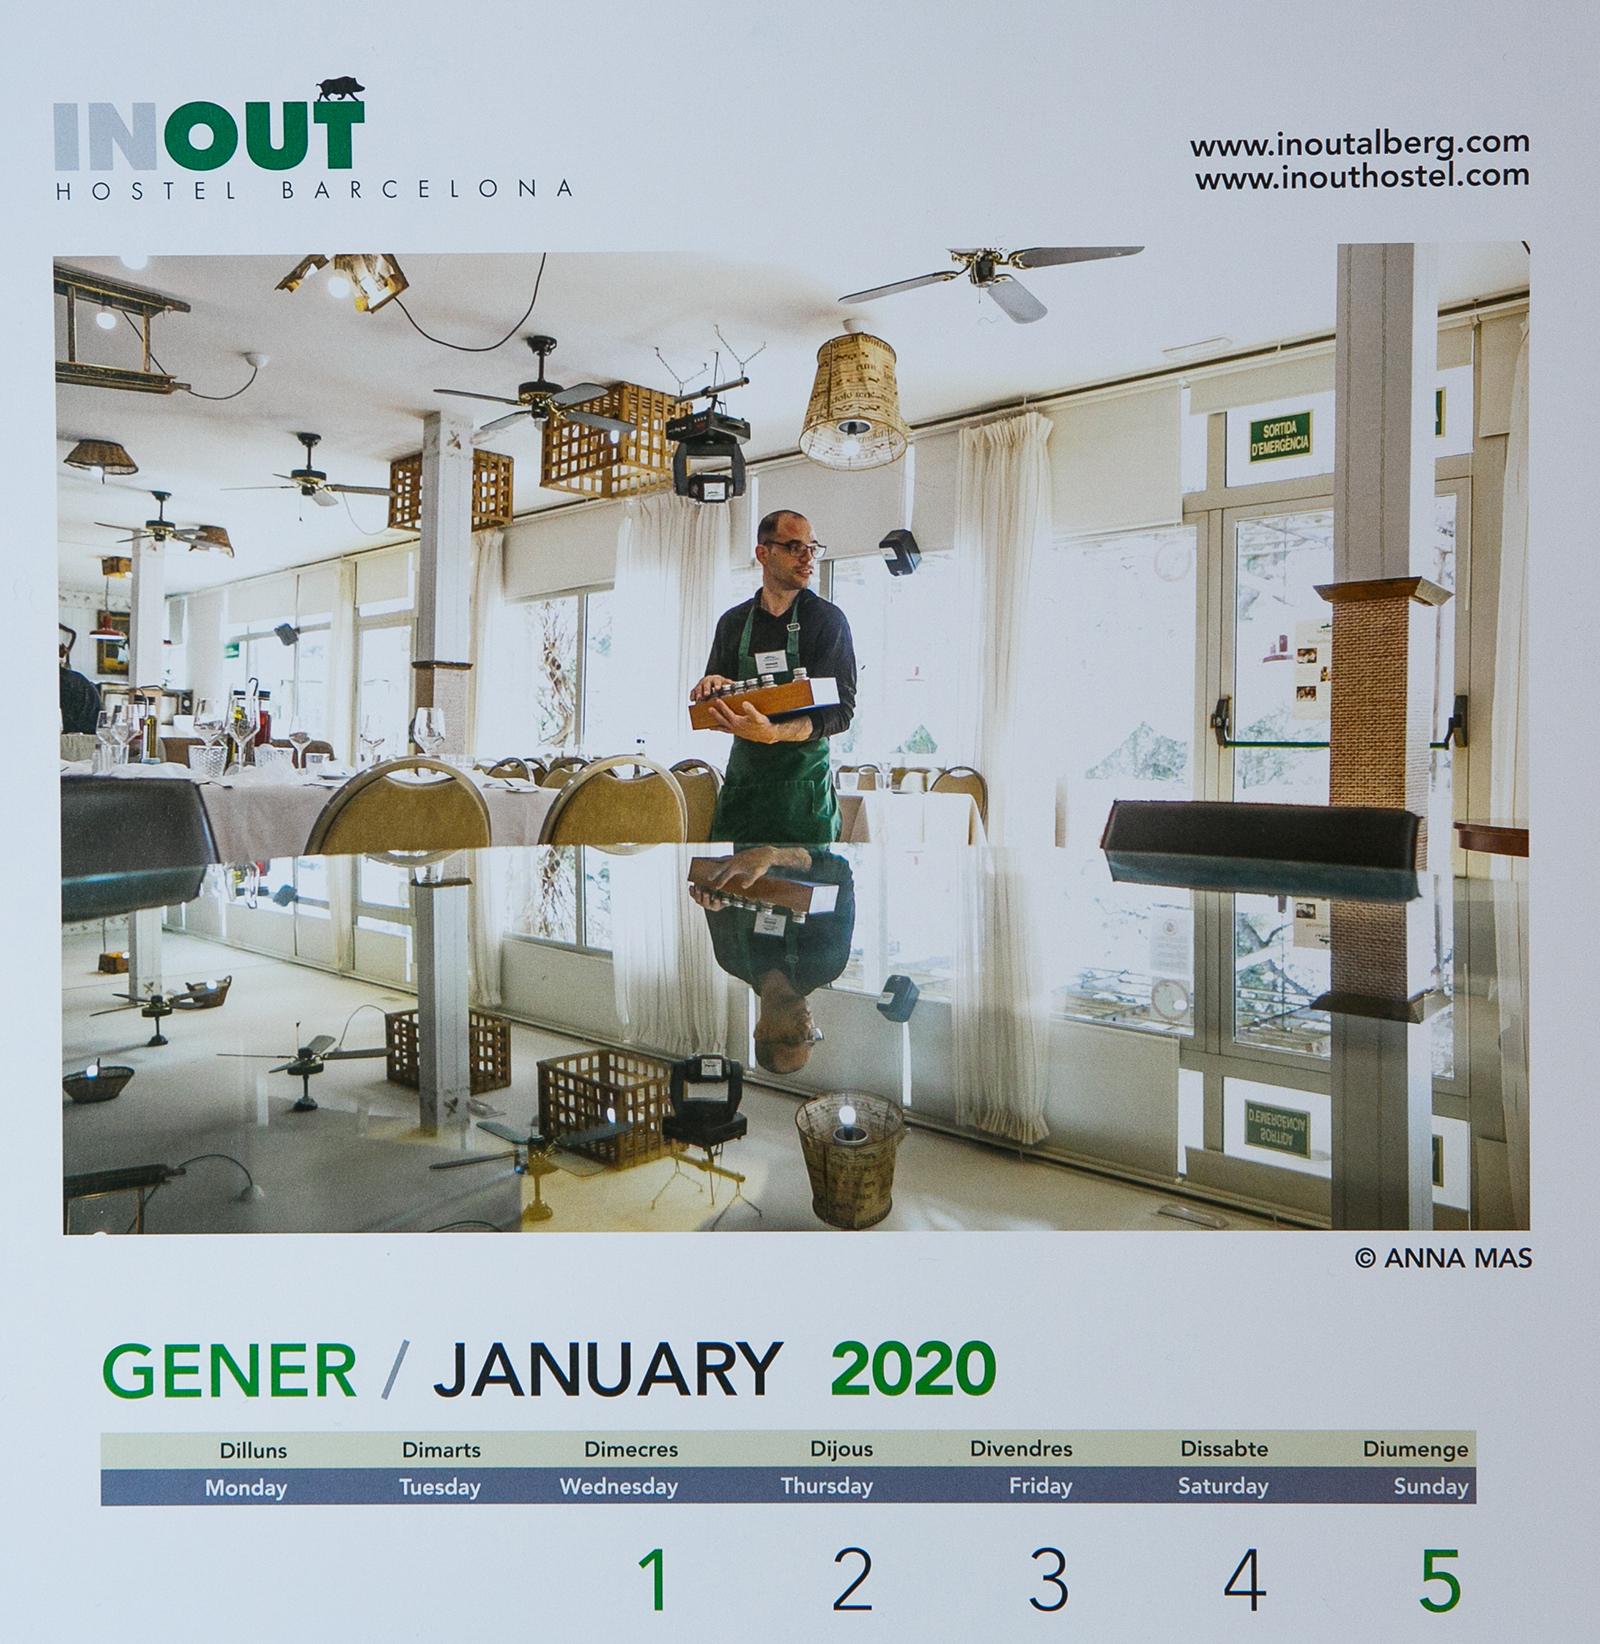 calendari 2020 Inout Hostel